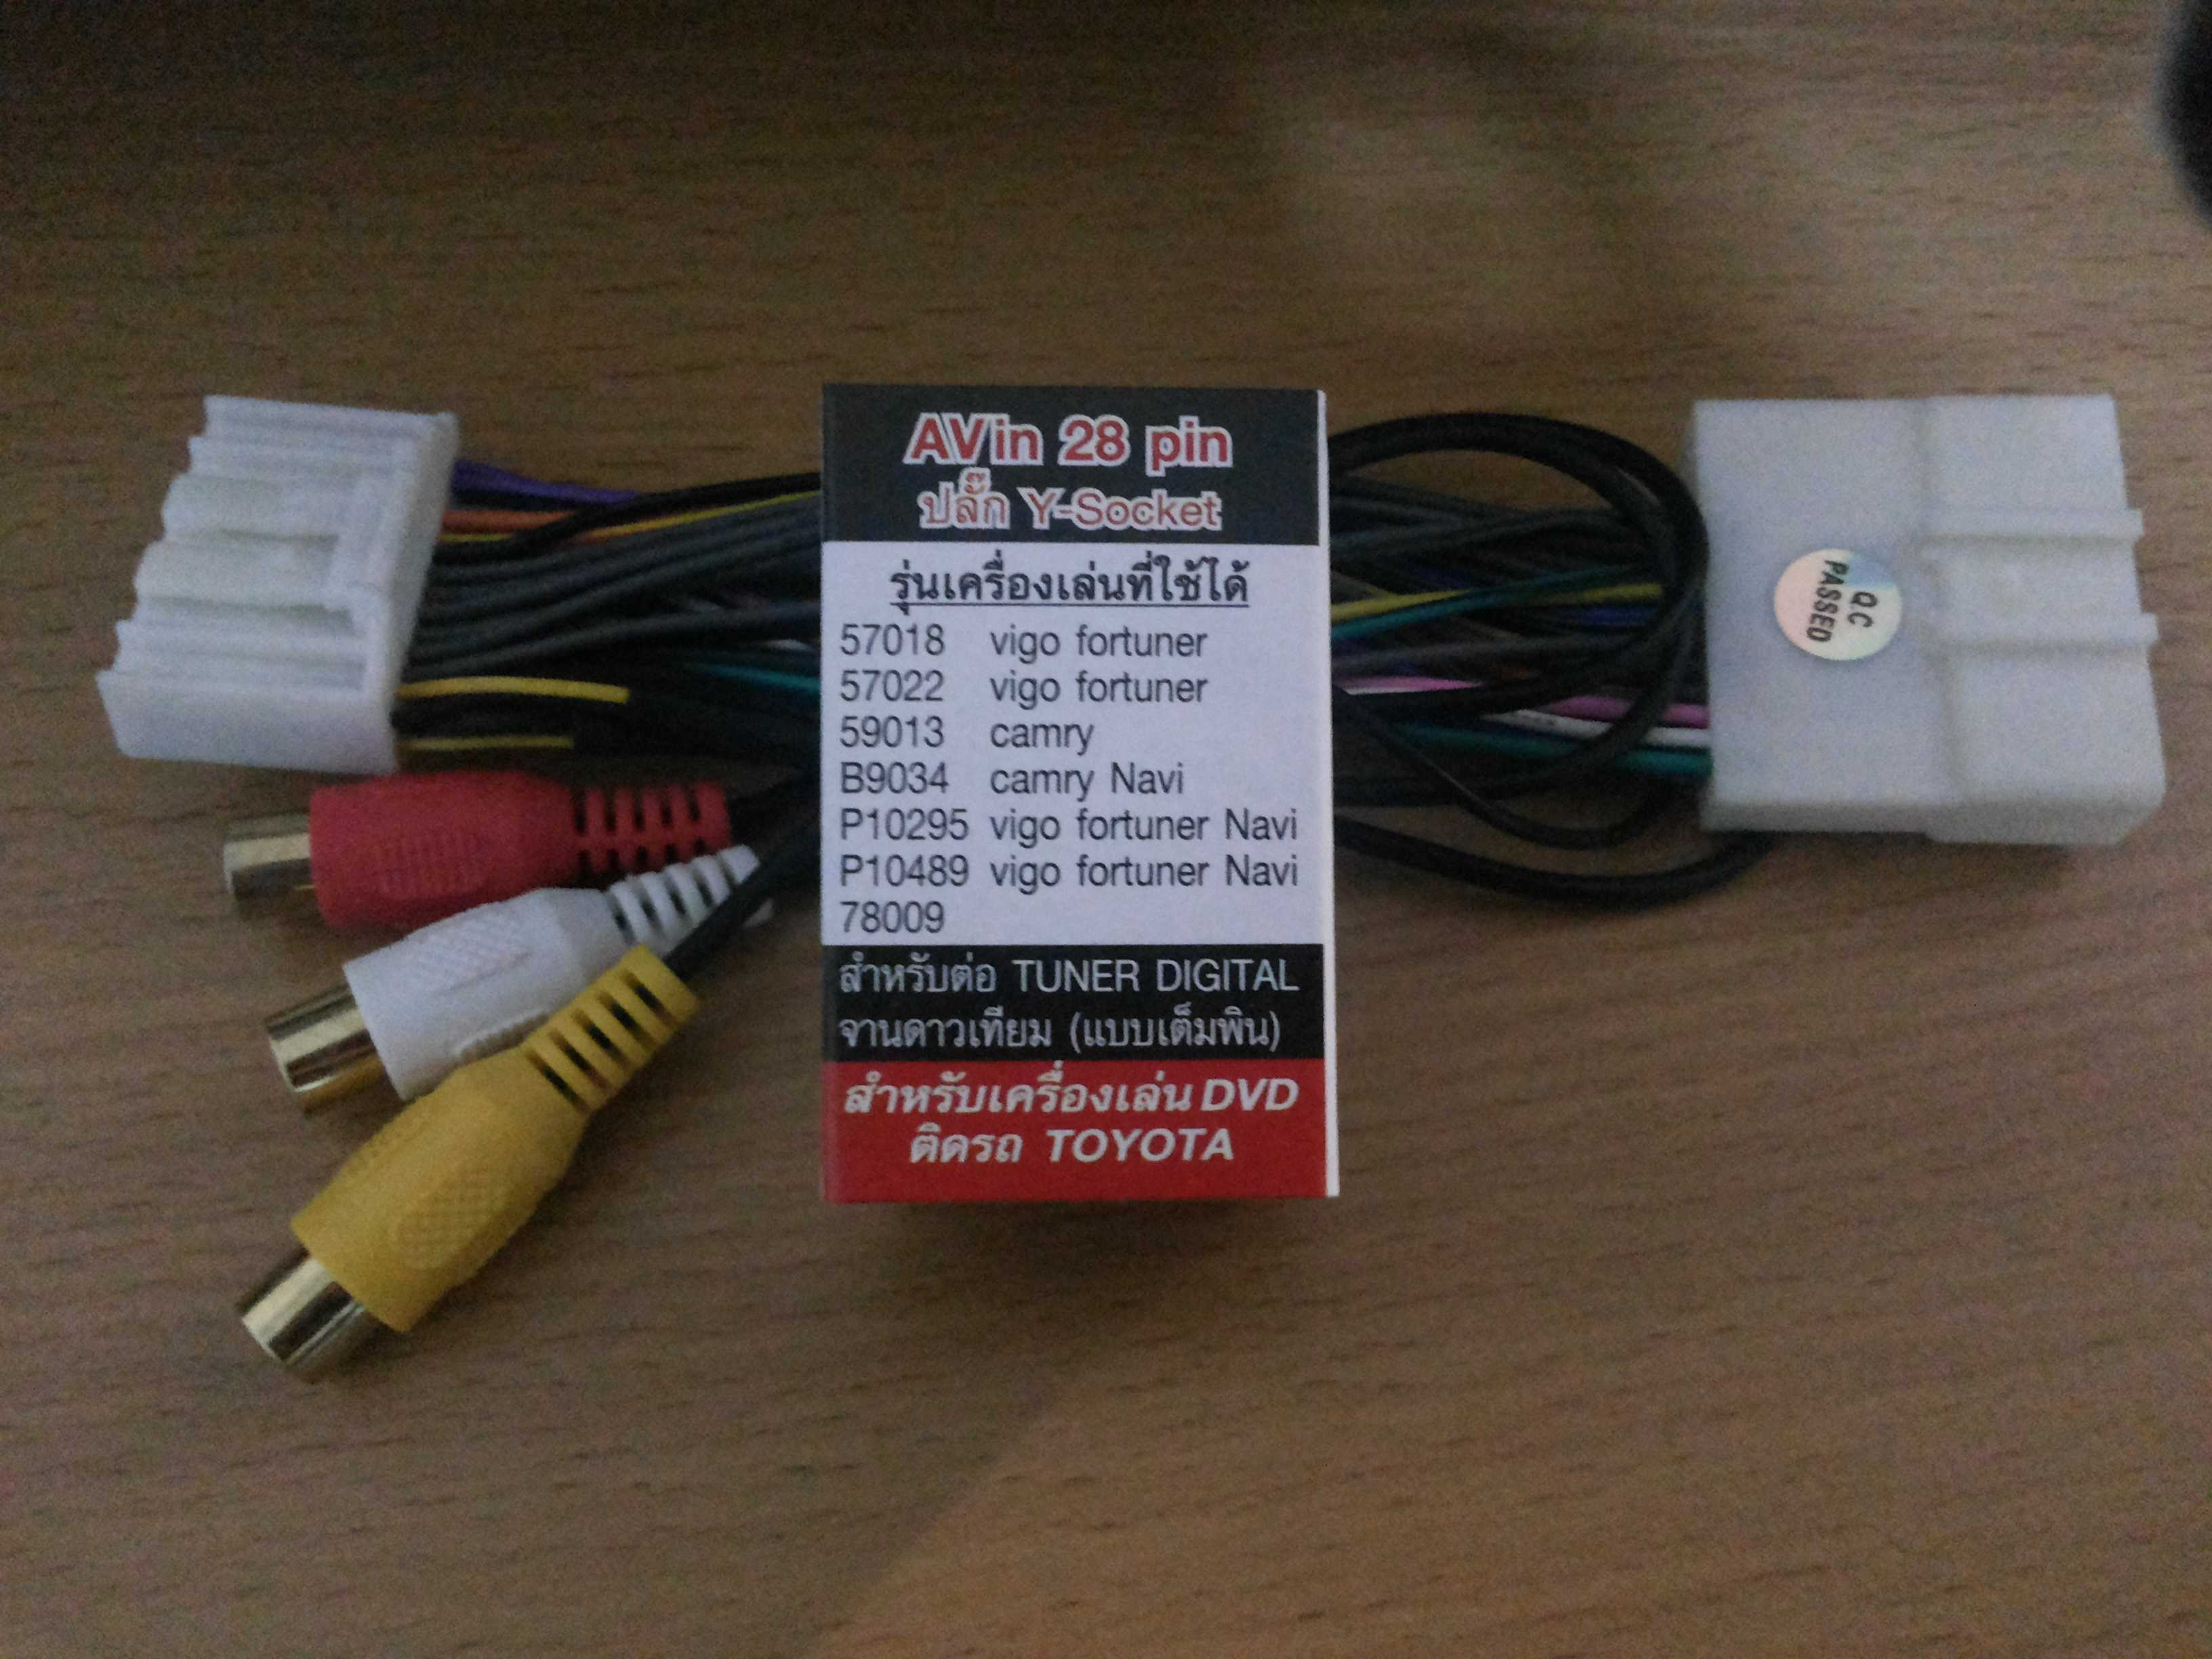 touch audio wiring y socket av in 28 pin av video audio cable for toyota touch 2 and  av in 28 pin av video audio cable